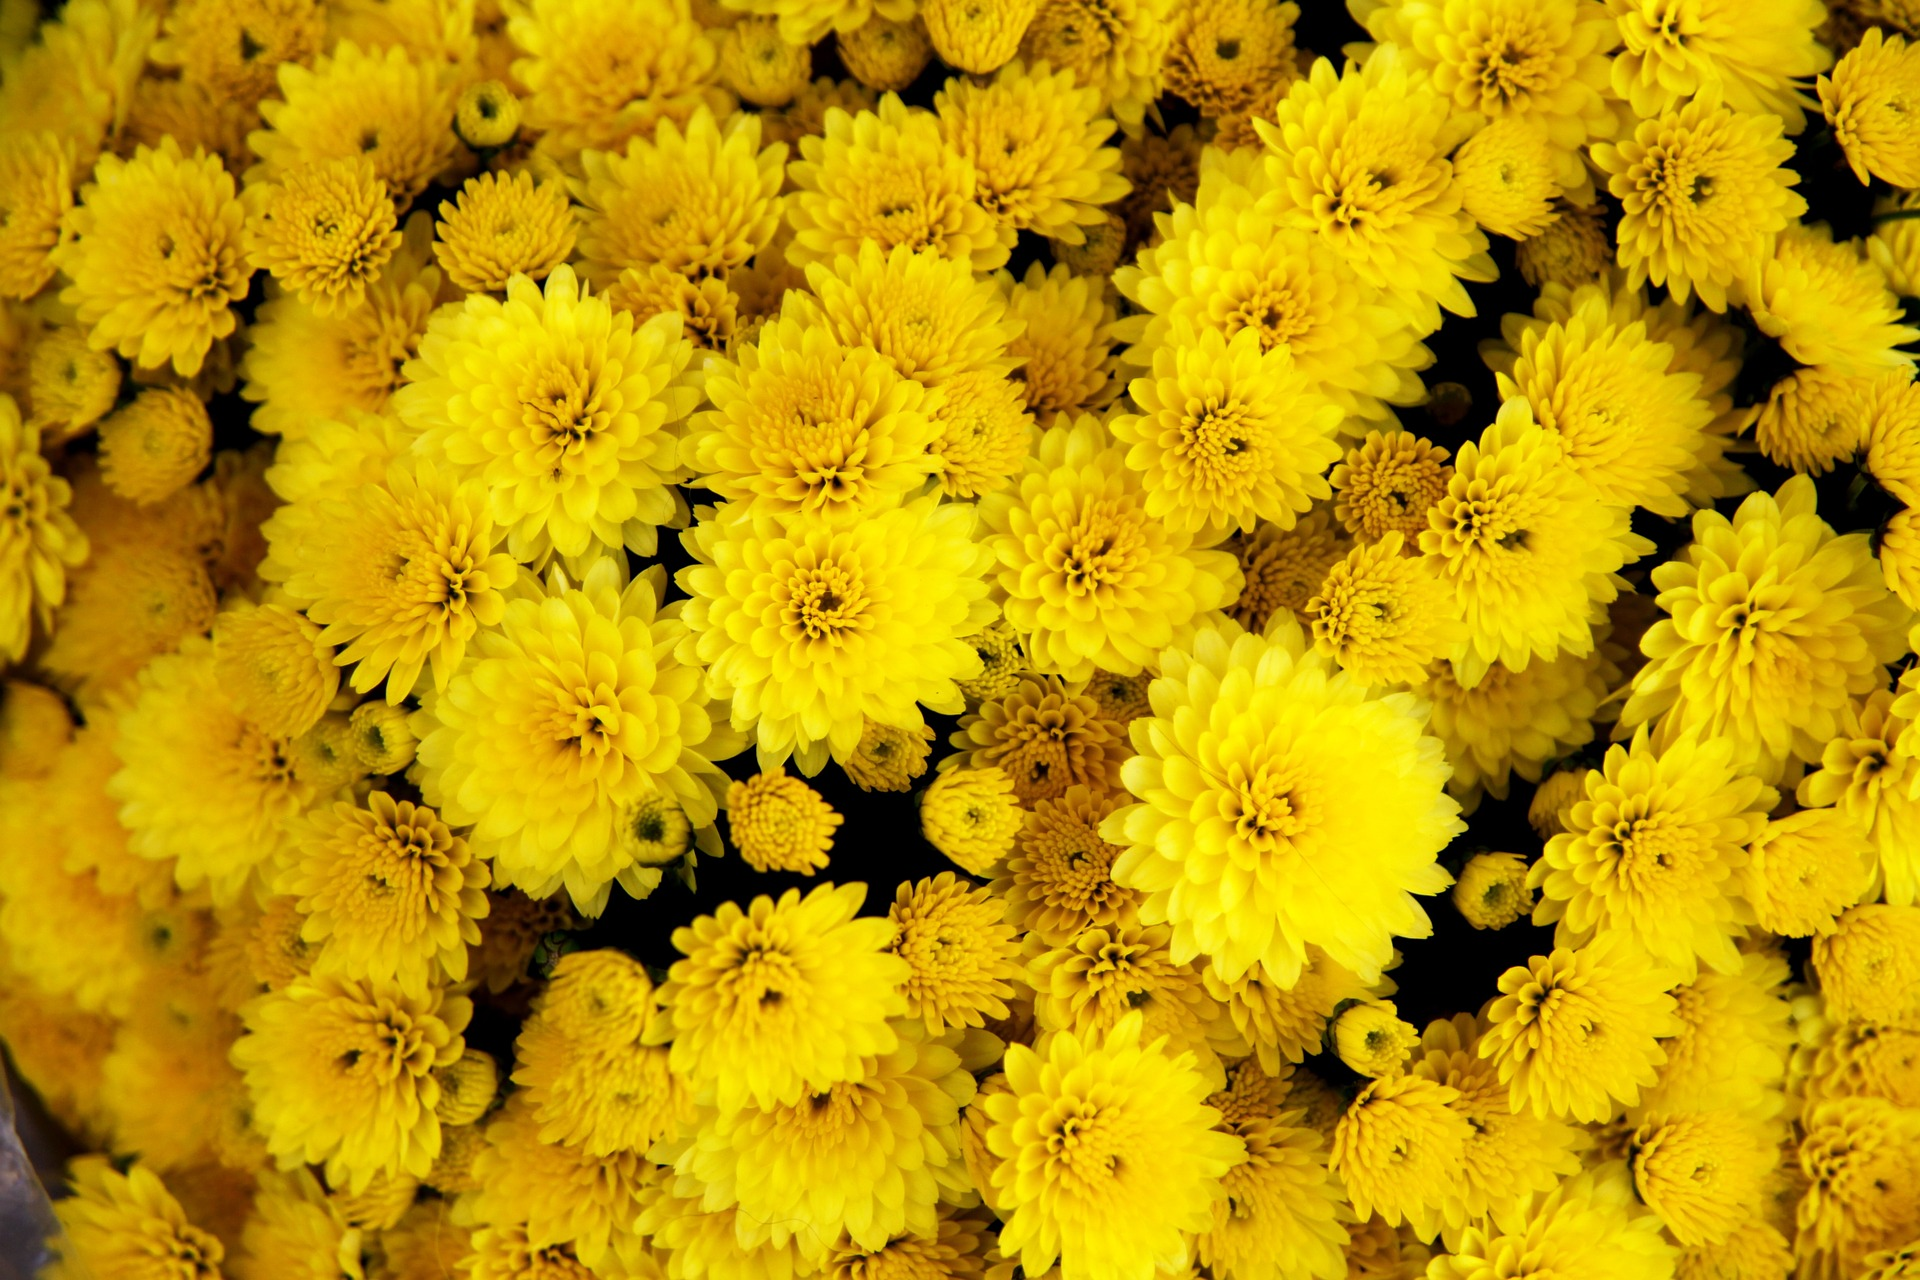 chrysanthemum, ju hua